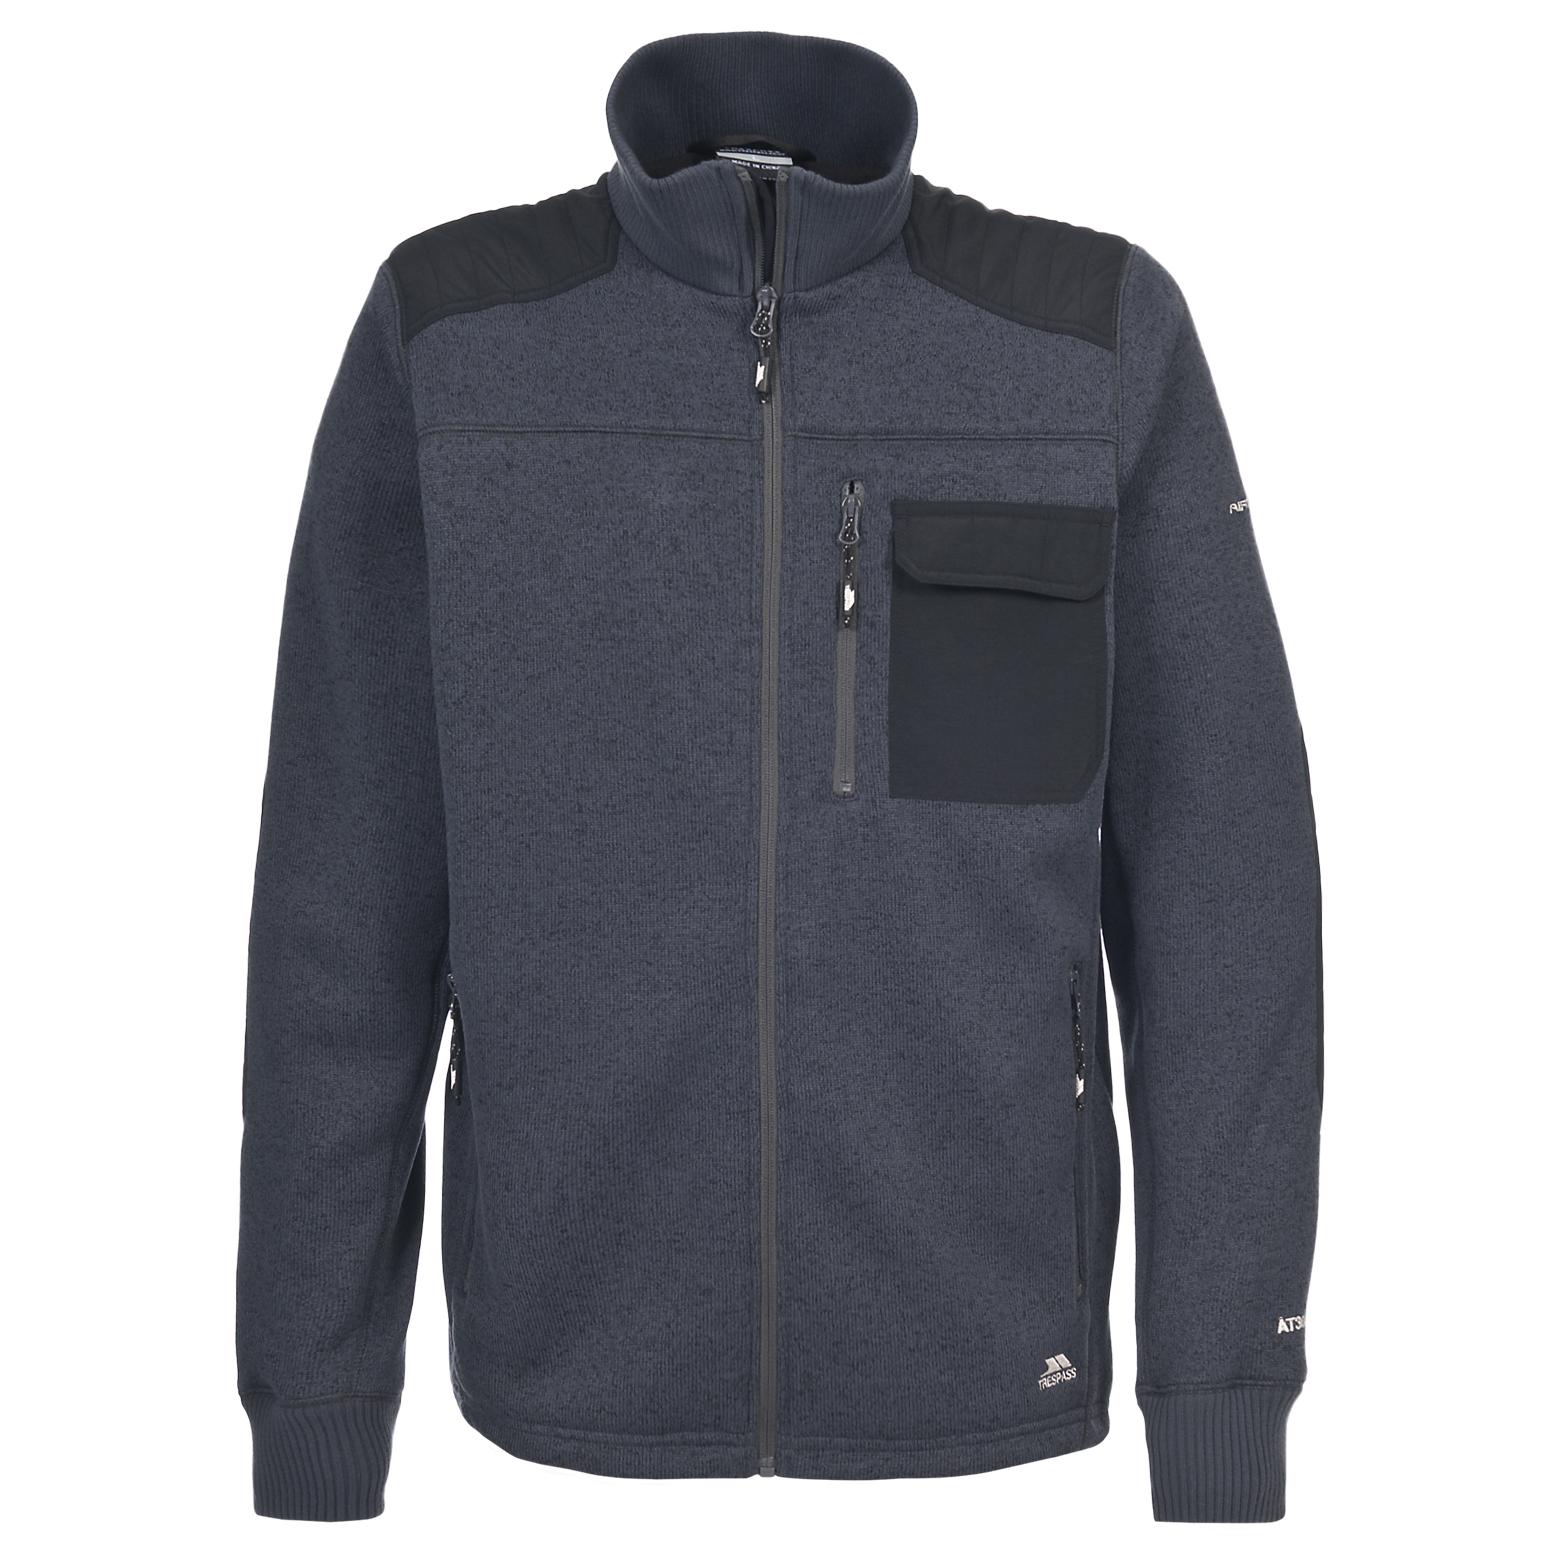 Trespass Rockvale Mens Full Zip Knitted Fleece Jacket eBay